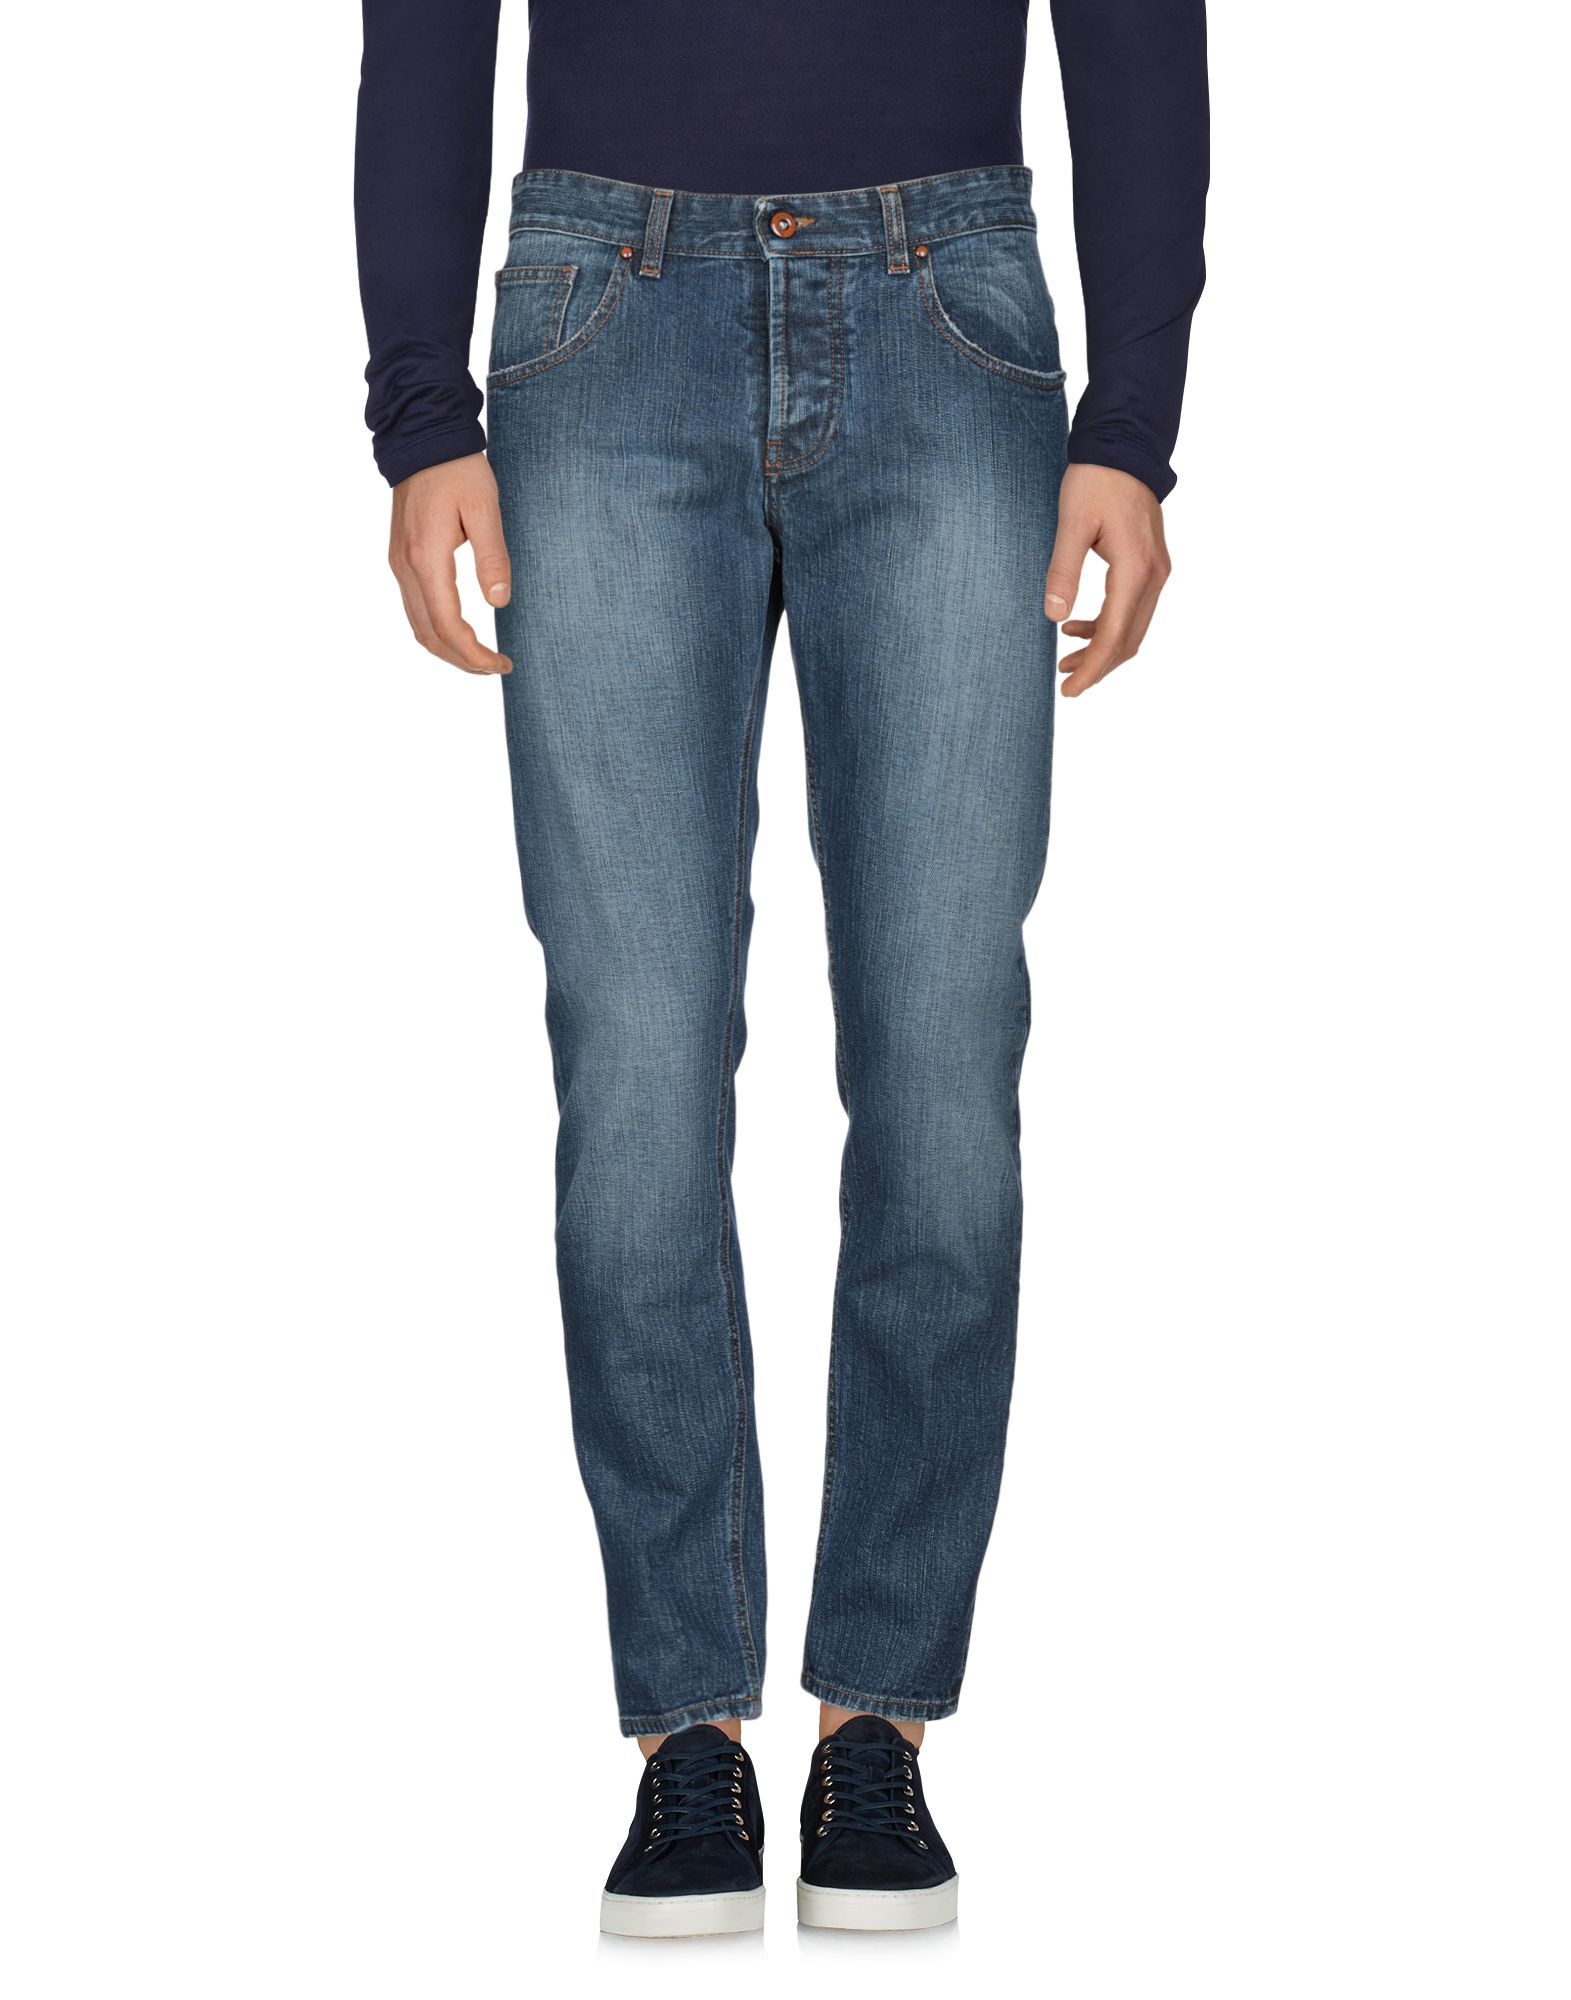 Pantaloni Jeans Santaniello Napoli Uomo - 42687871ND 42687871ND - 8b1ac8